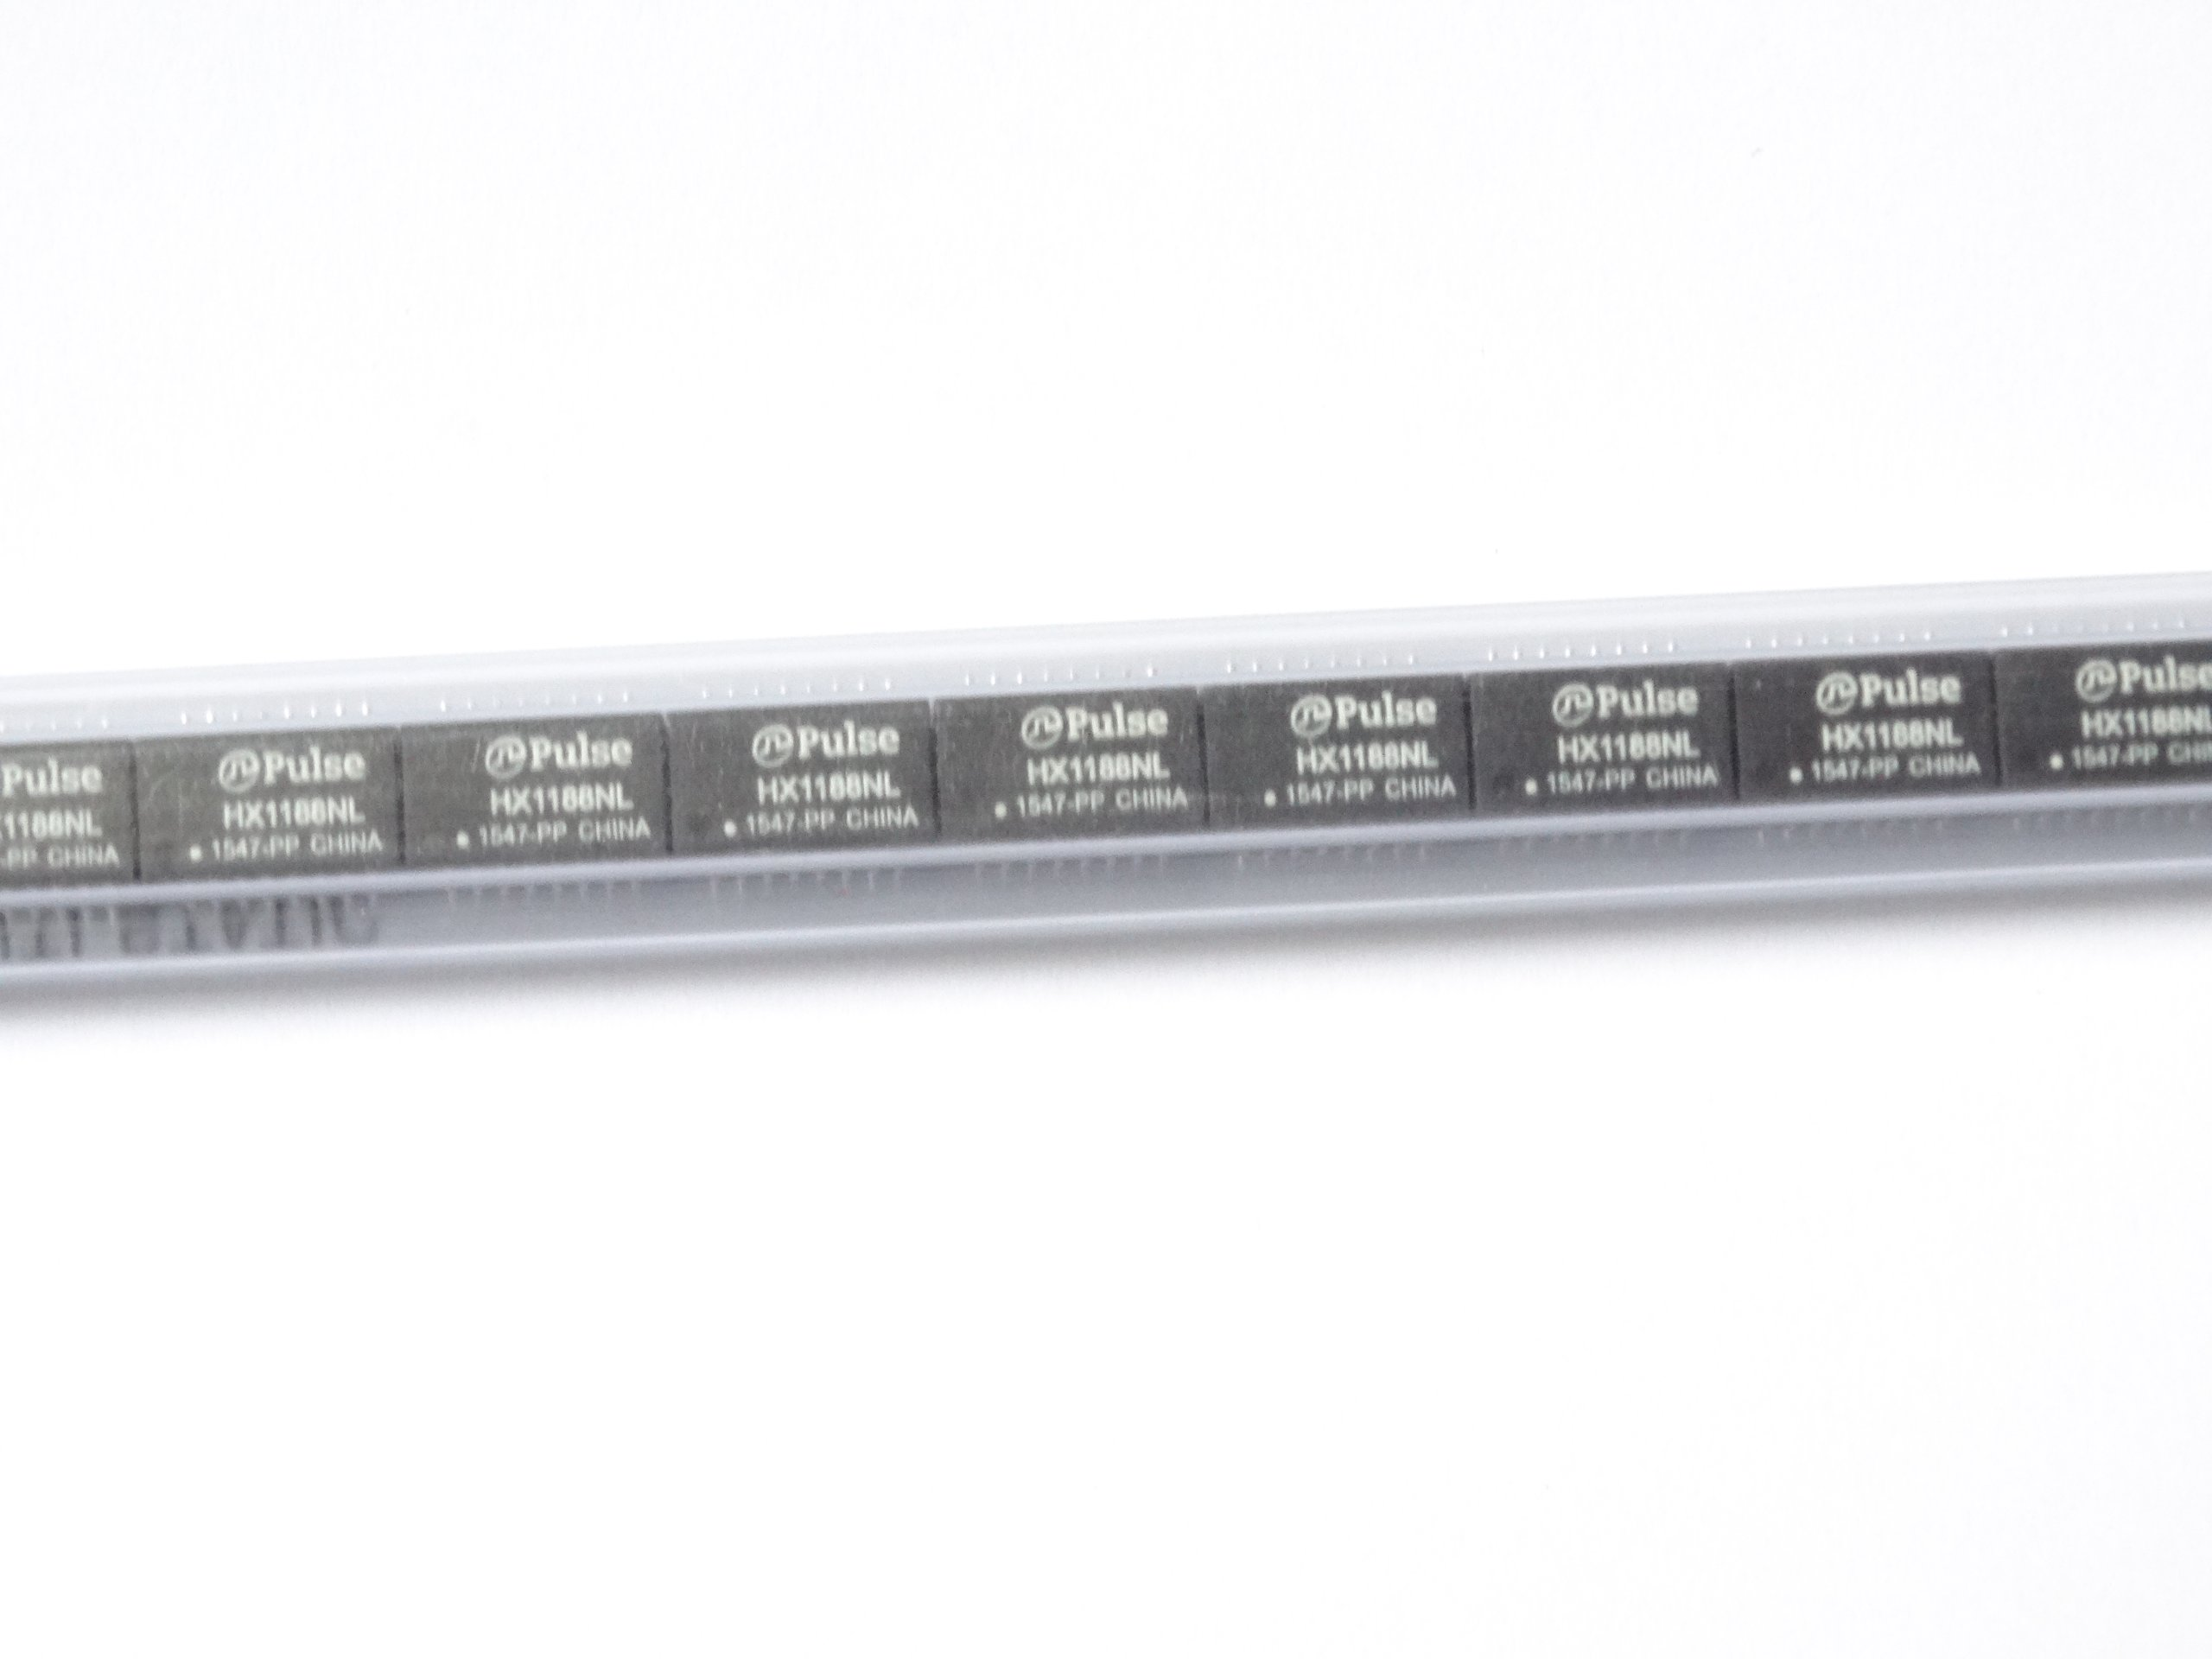 Transformator Ethernet HX1188NL SOIC16 - 10 szt.